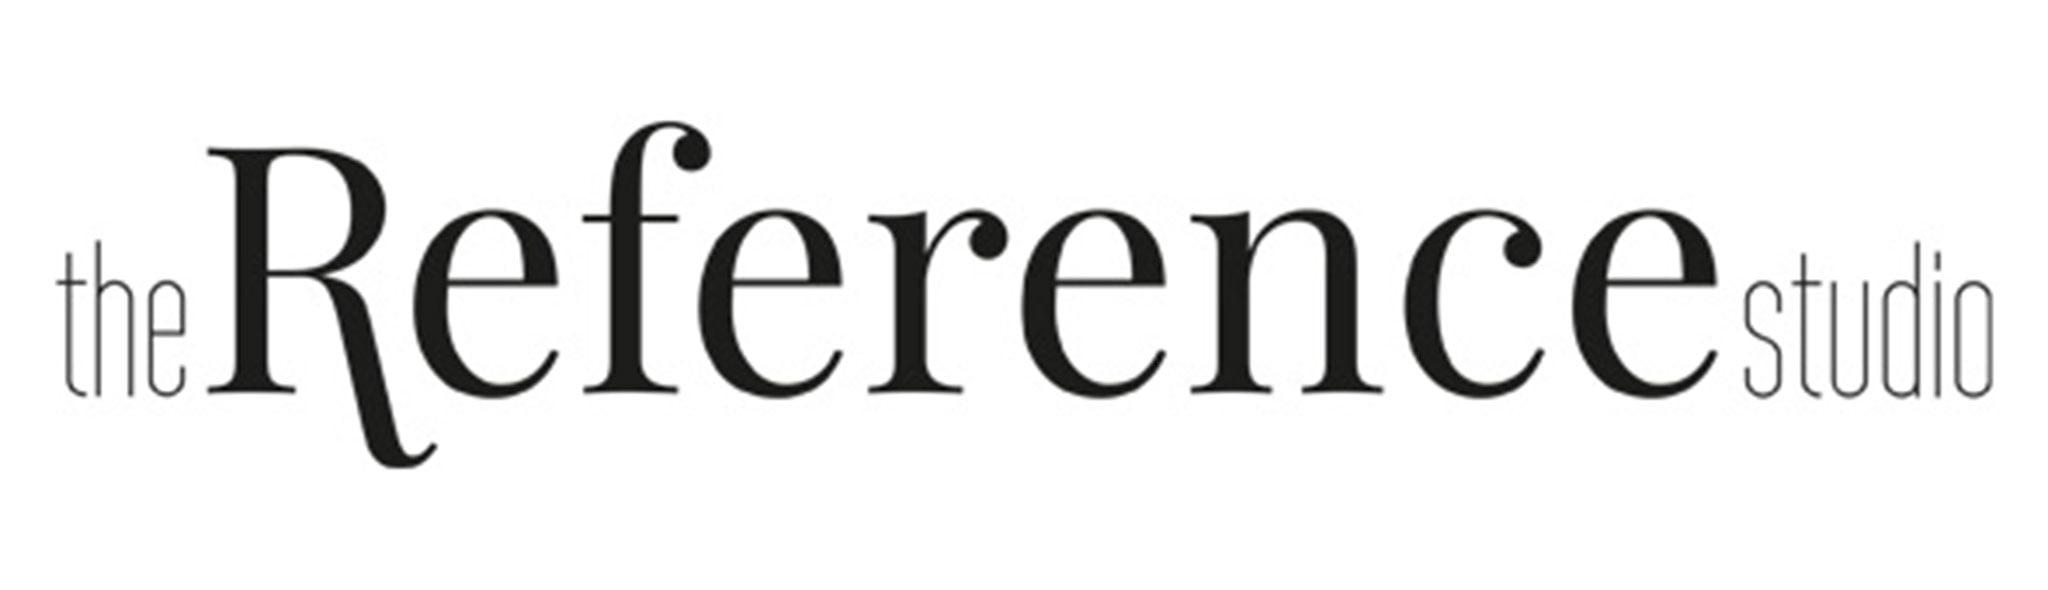 Logotipo de The Reference Studio